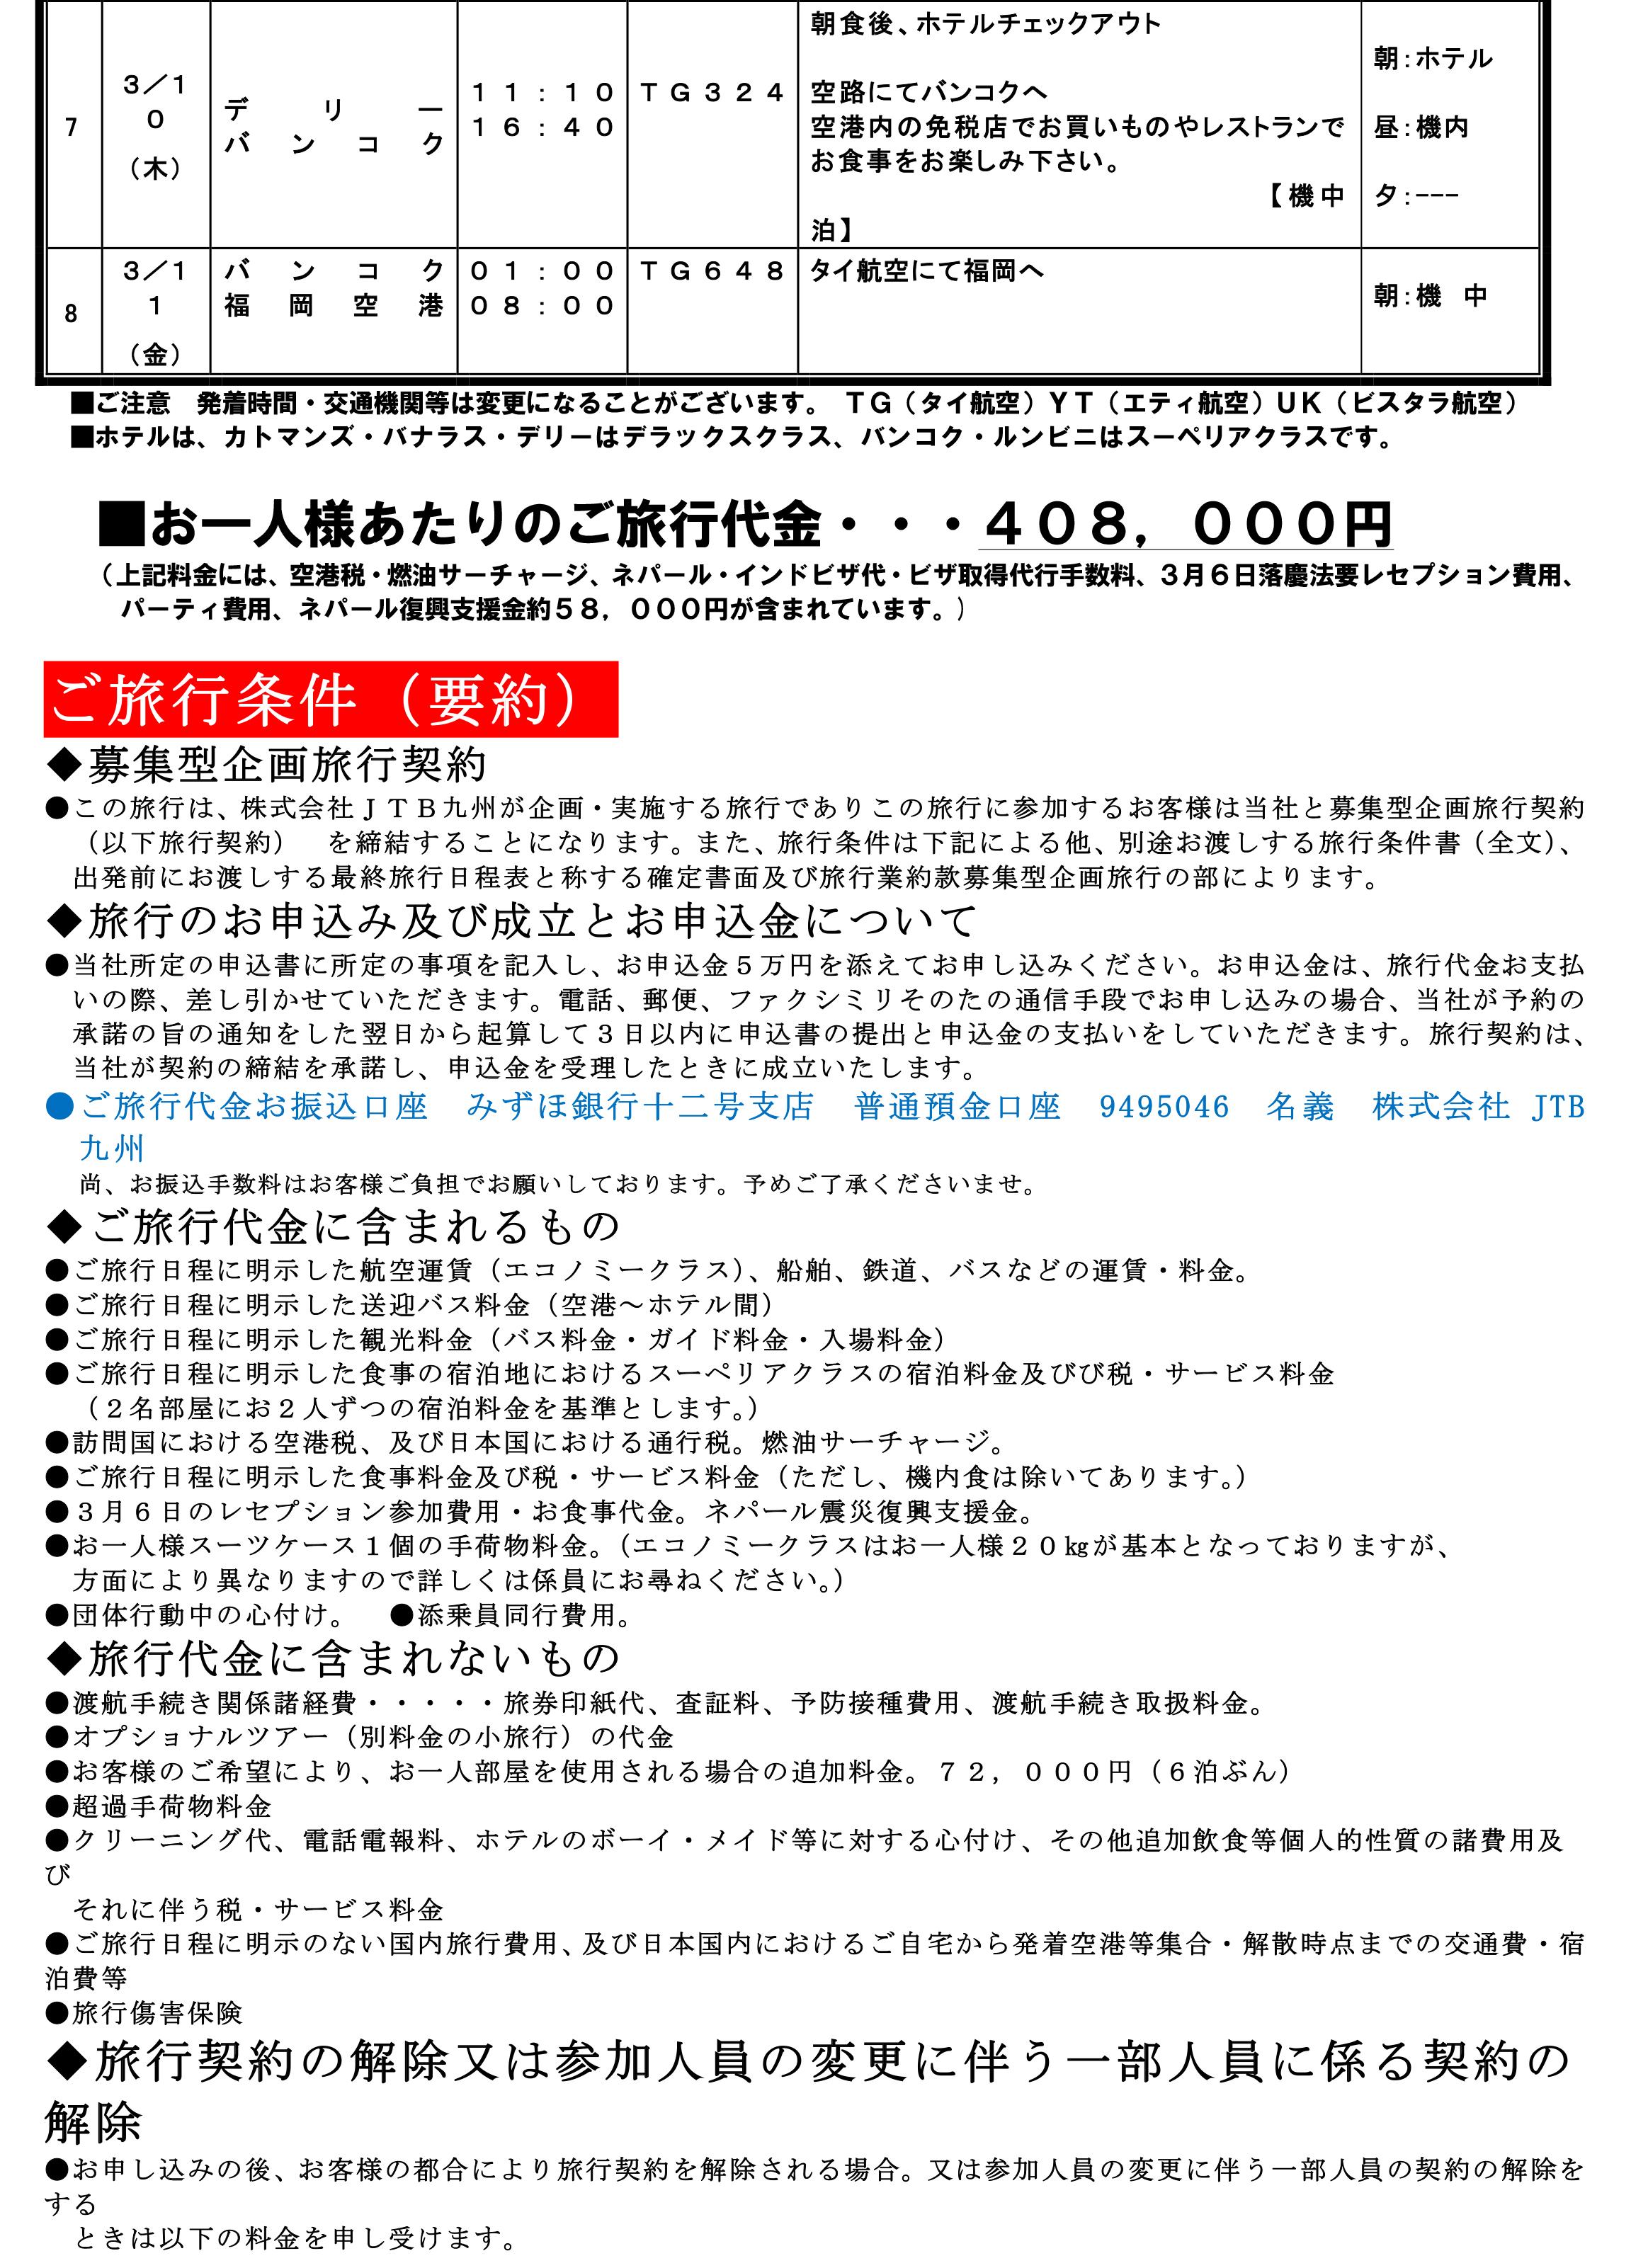 Microsoft Word - カトマンズ本願寺募集チラシ最終.d